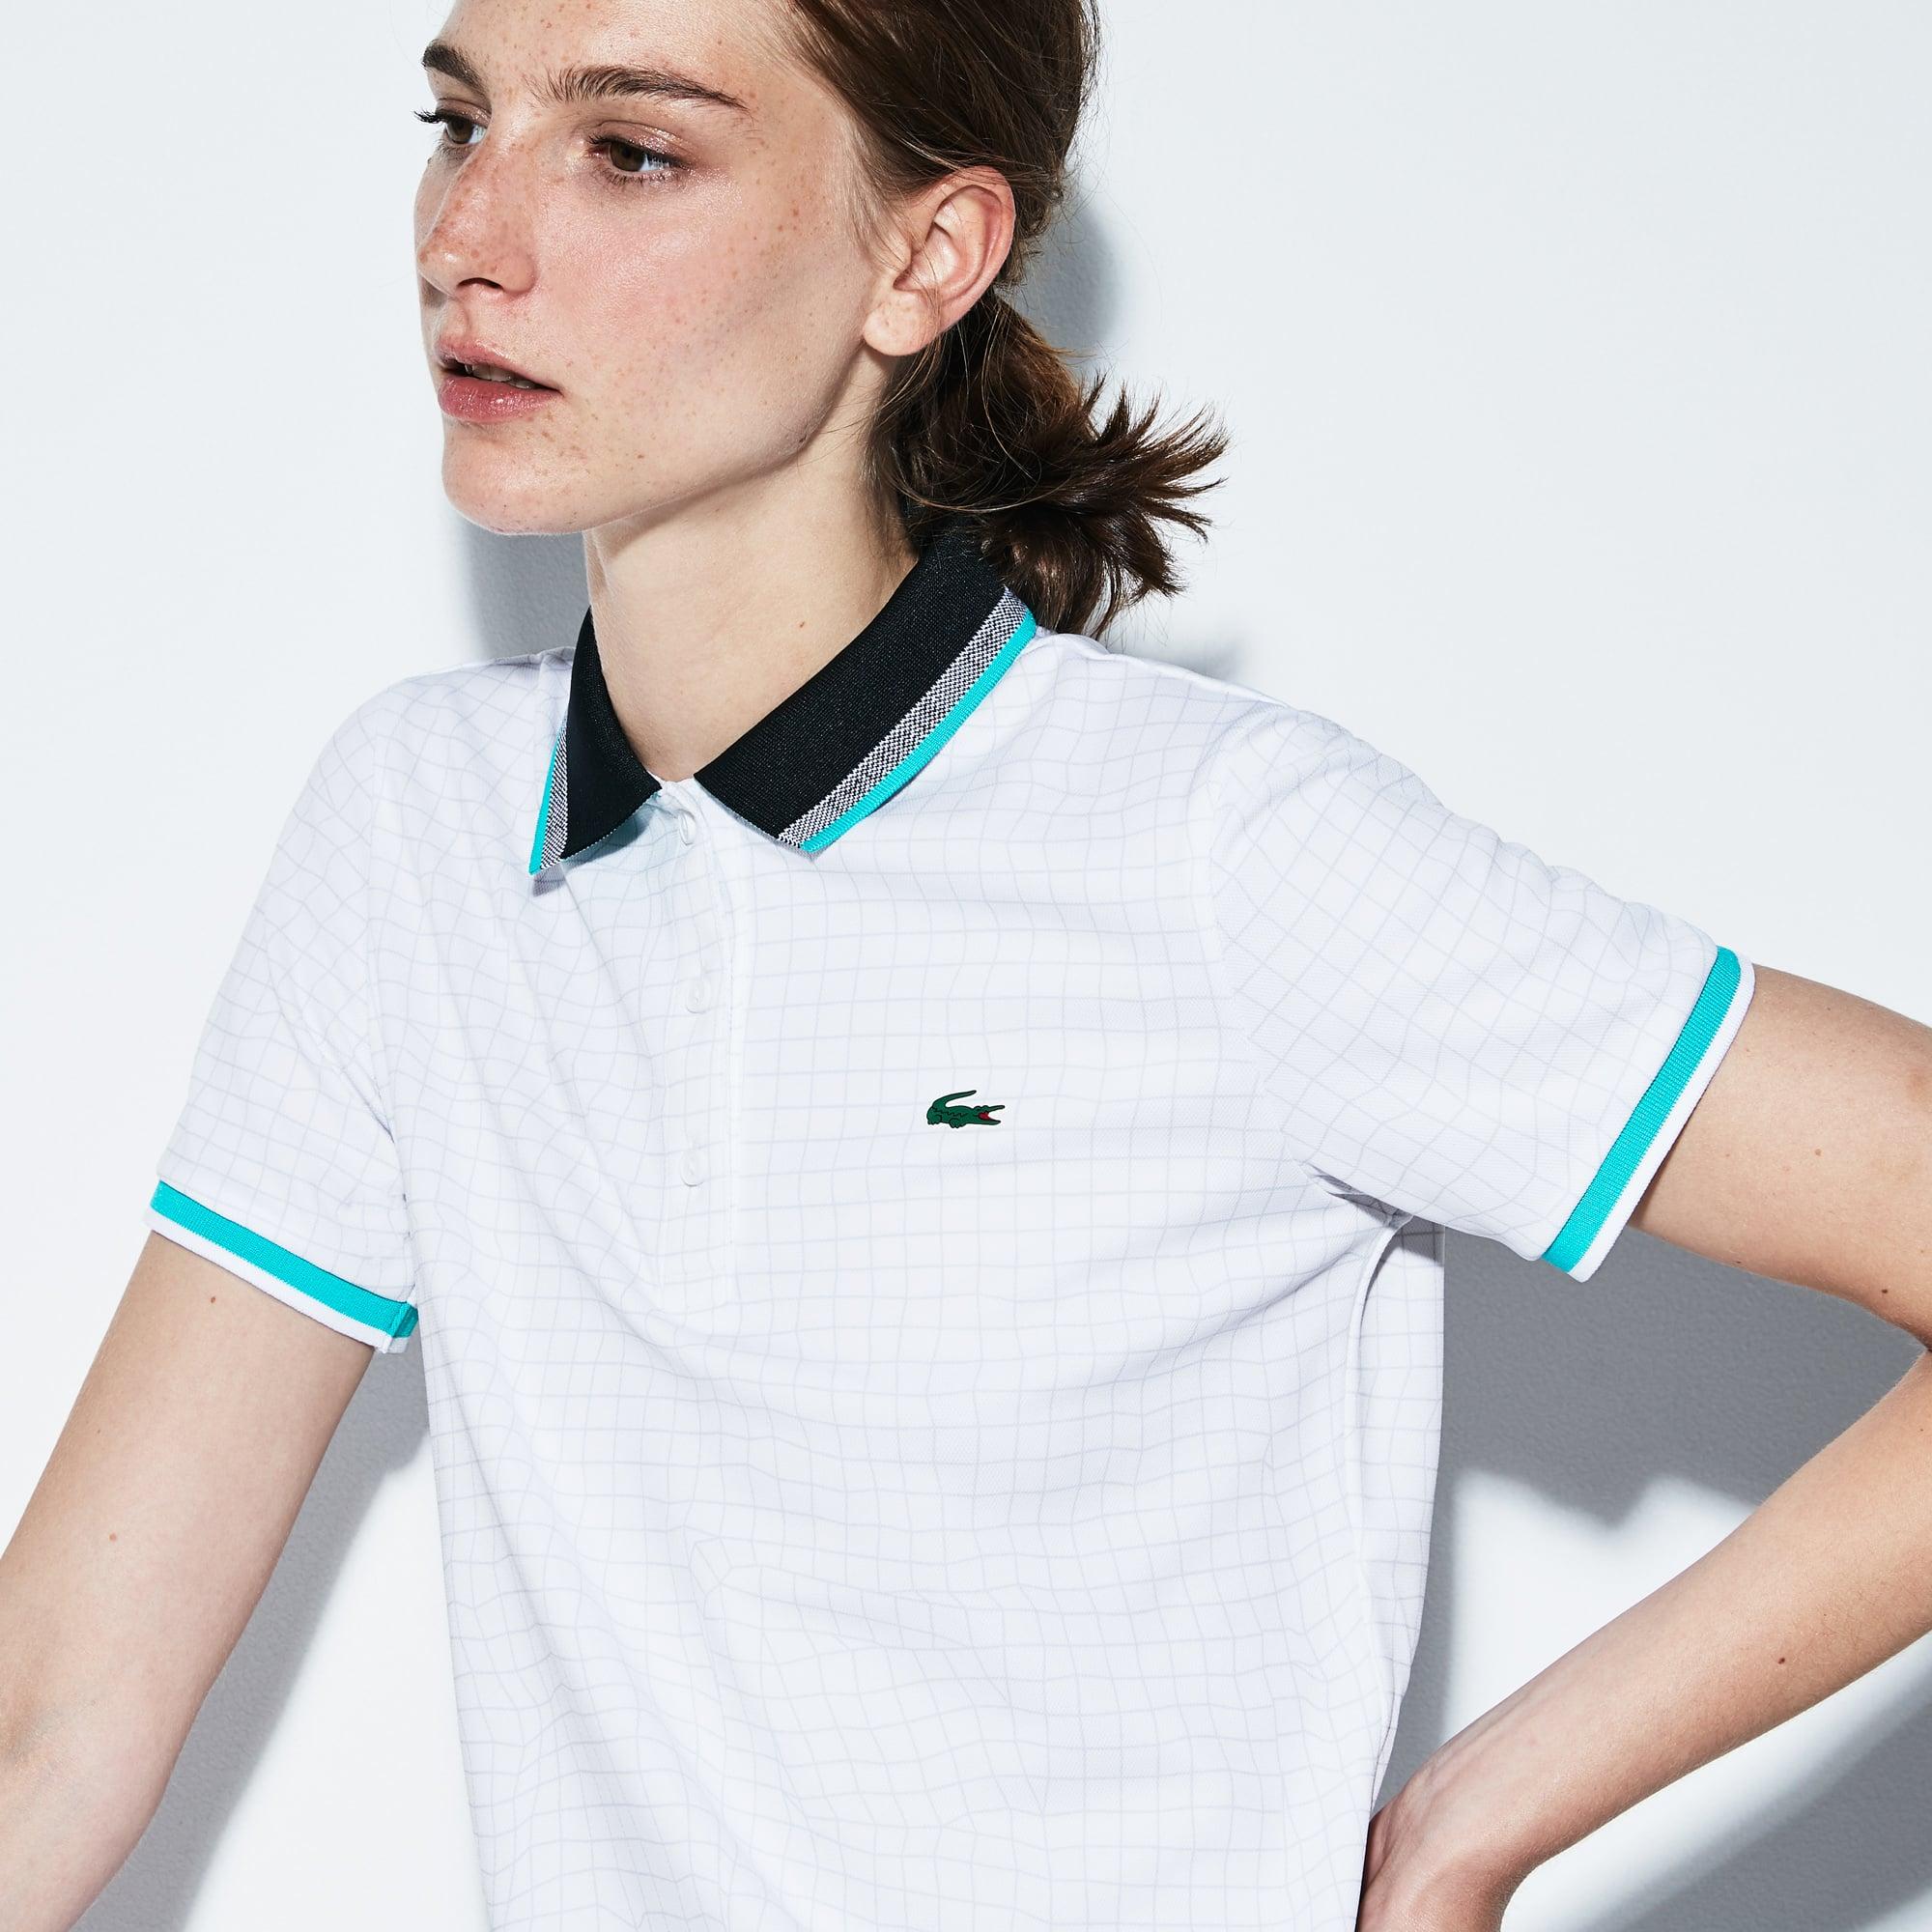 c3e0e895e1 Polo Shirts for Women